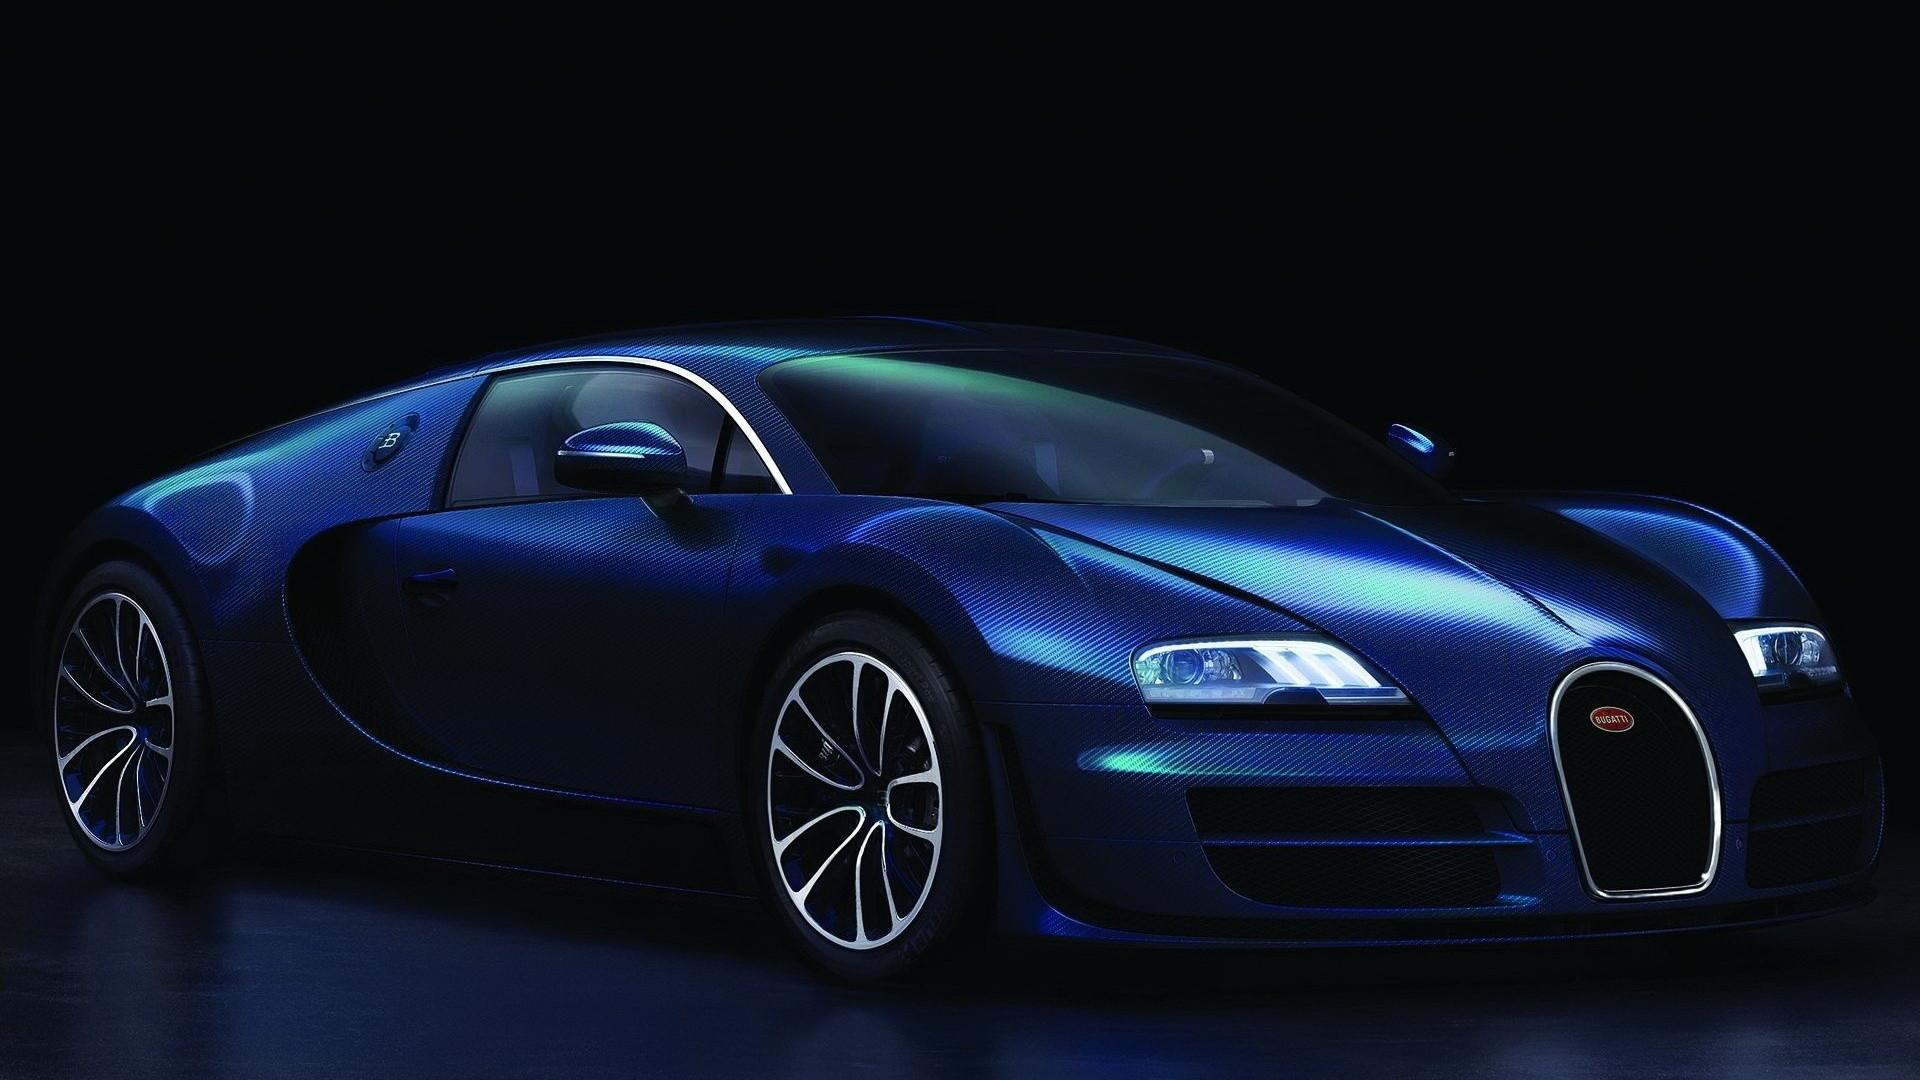 Bugatti Chiron Wallpapers (74+ Images